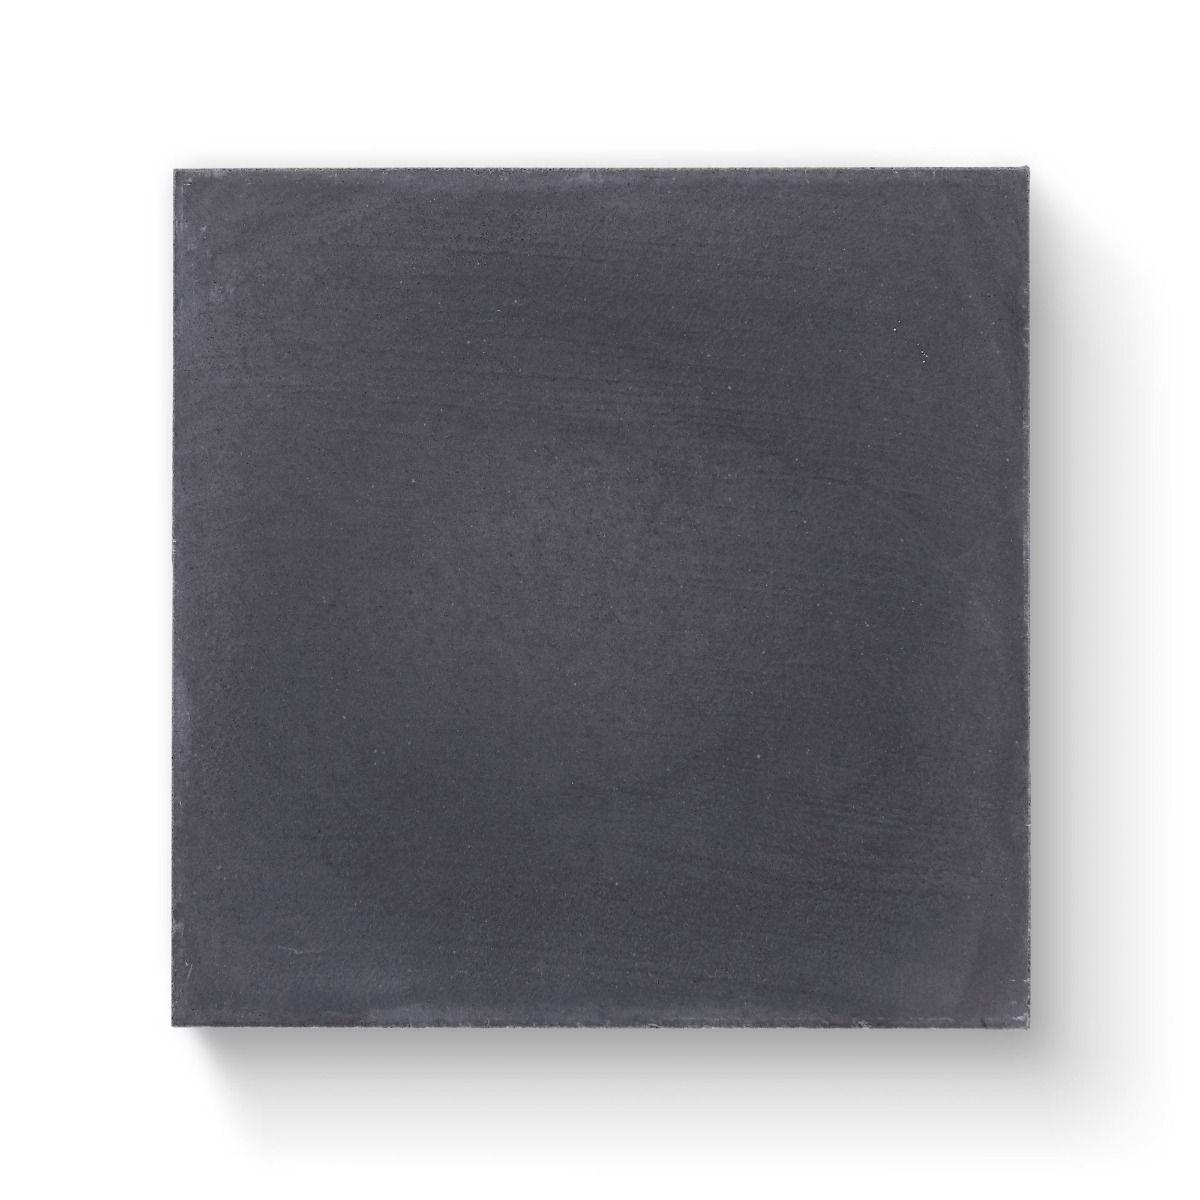 Bert & May Old Iron Plain Tile 20cm x 20cm